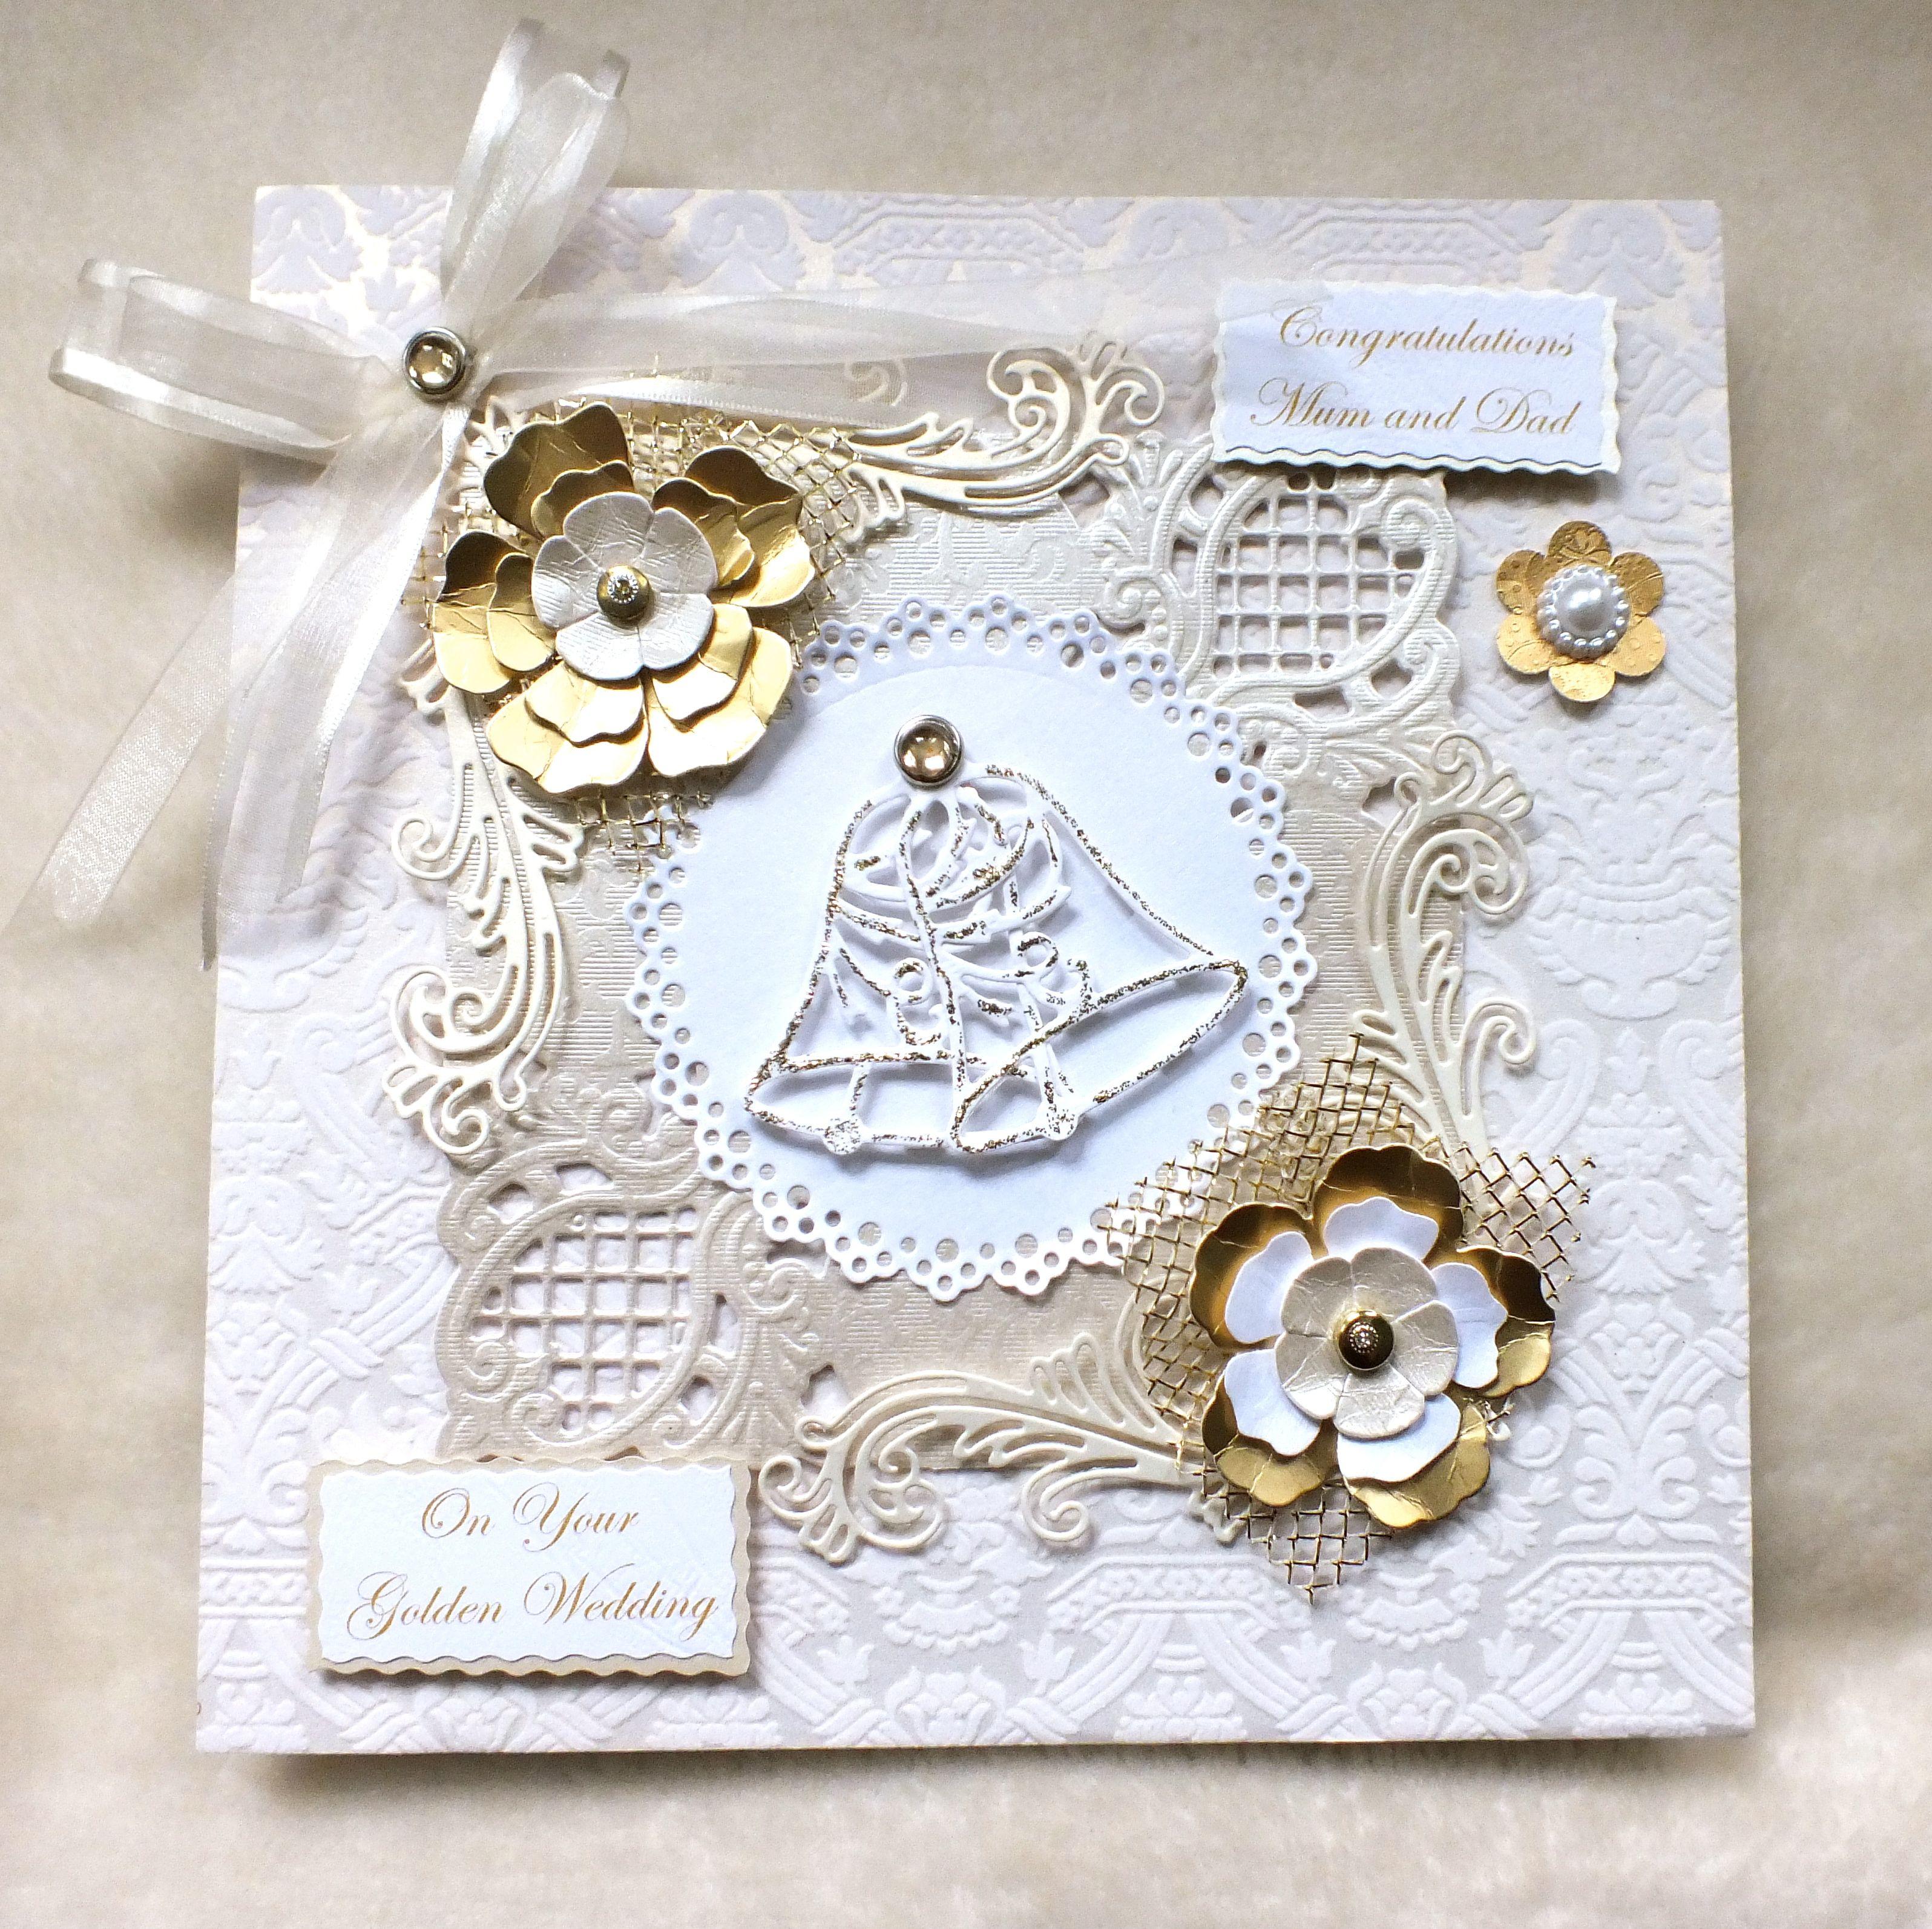 Wedding Card Ideas To Make: Handmade Golden Wedding Anniversary Card By Mandishella